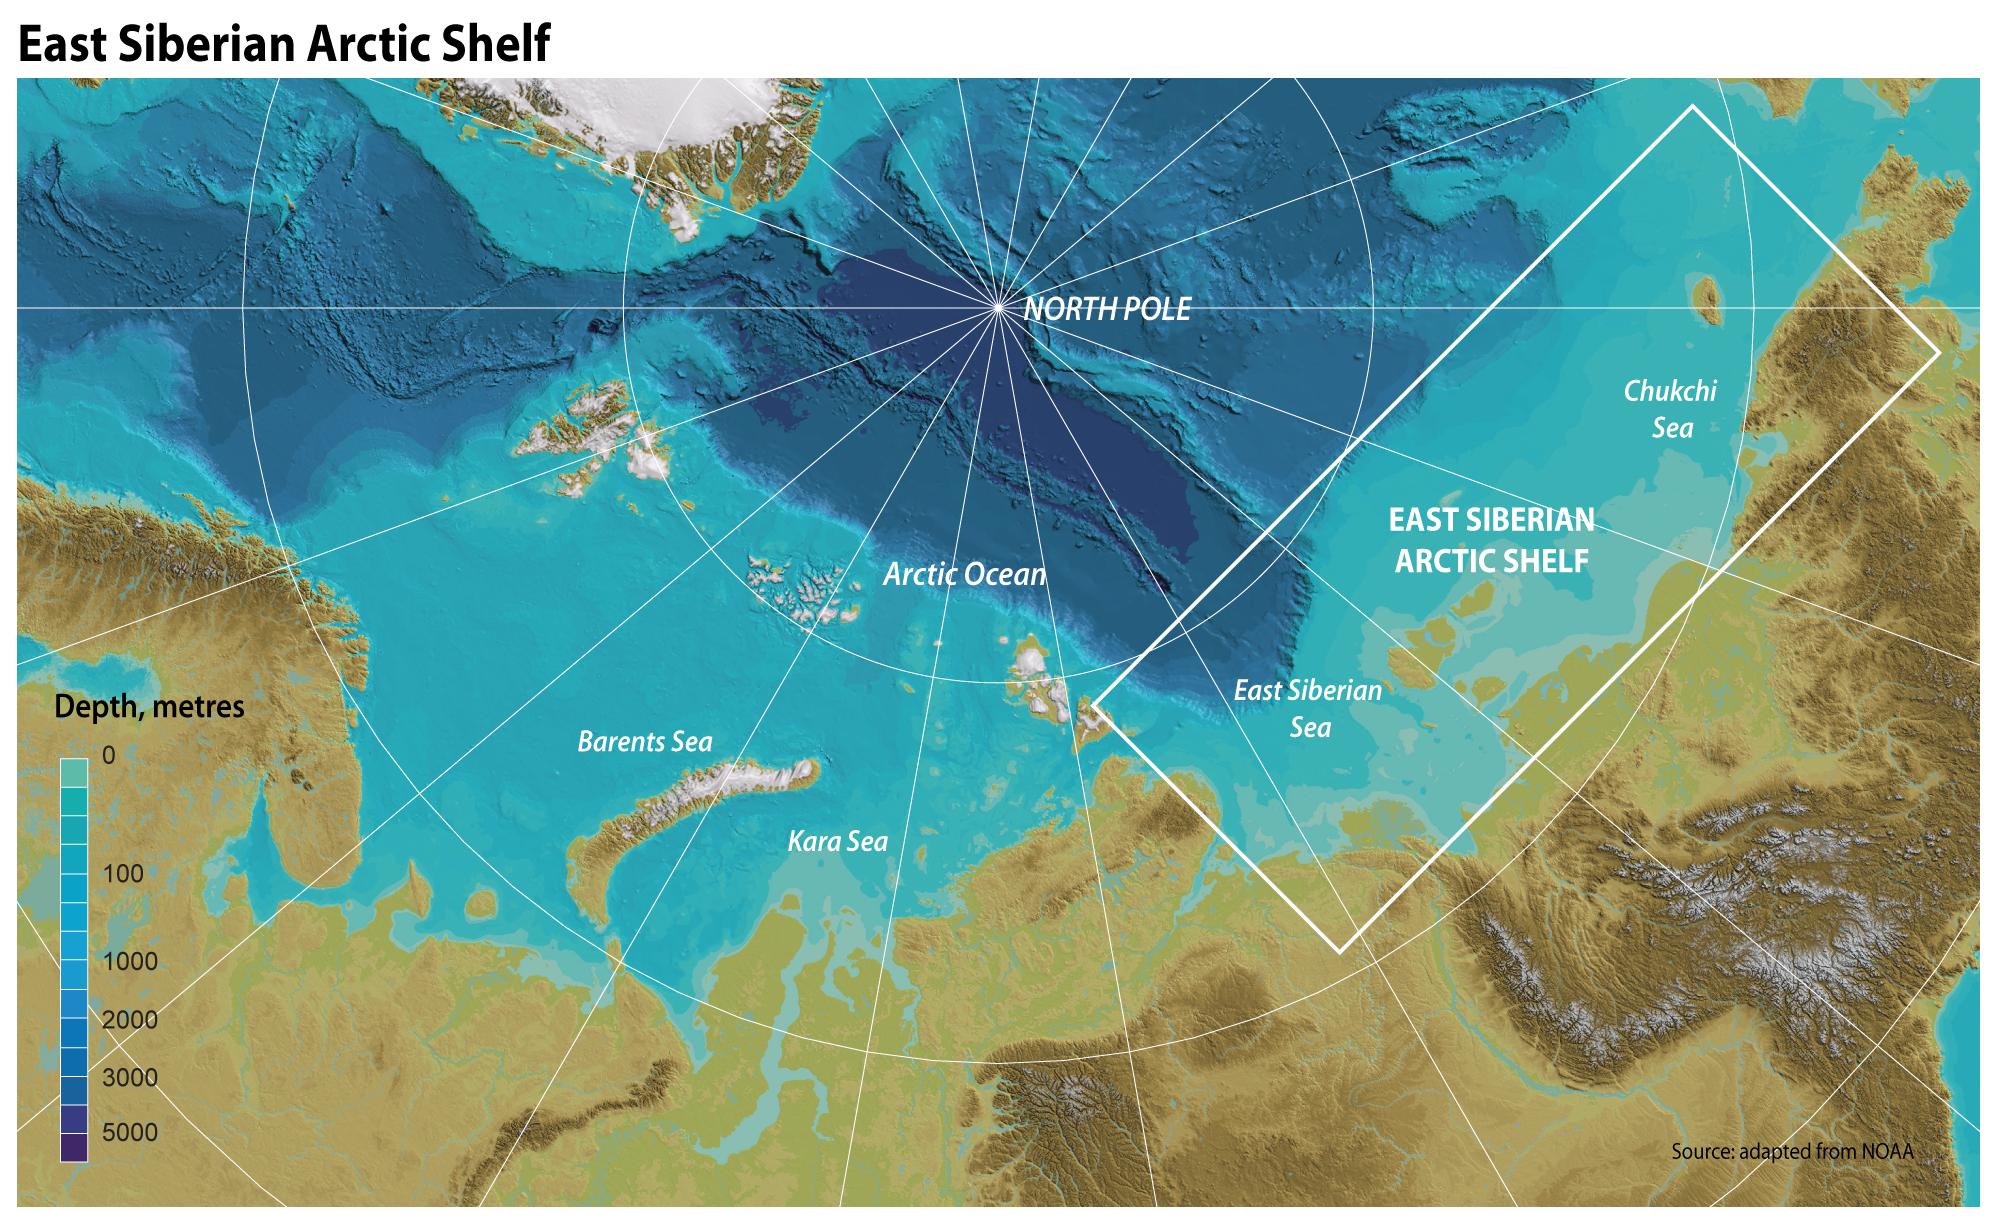 East Siberian Sea: Description, Resources and Problems 55